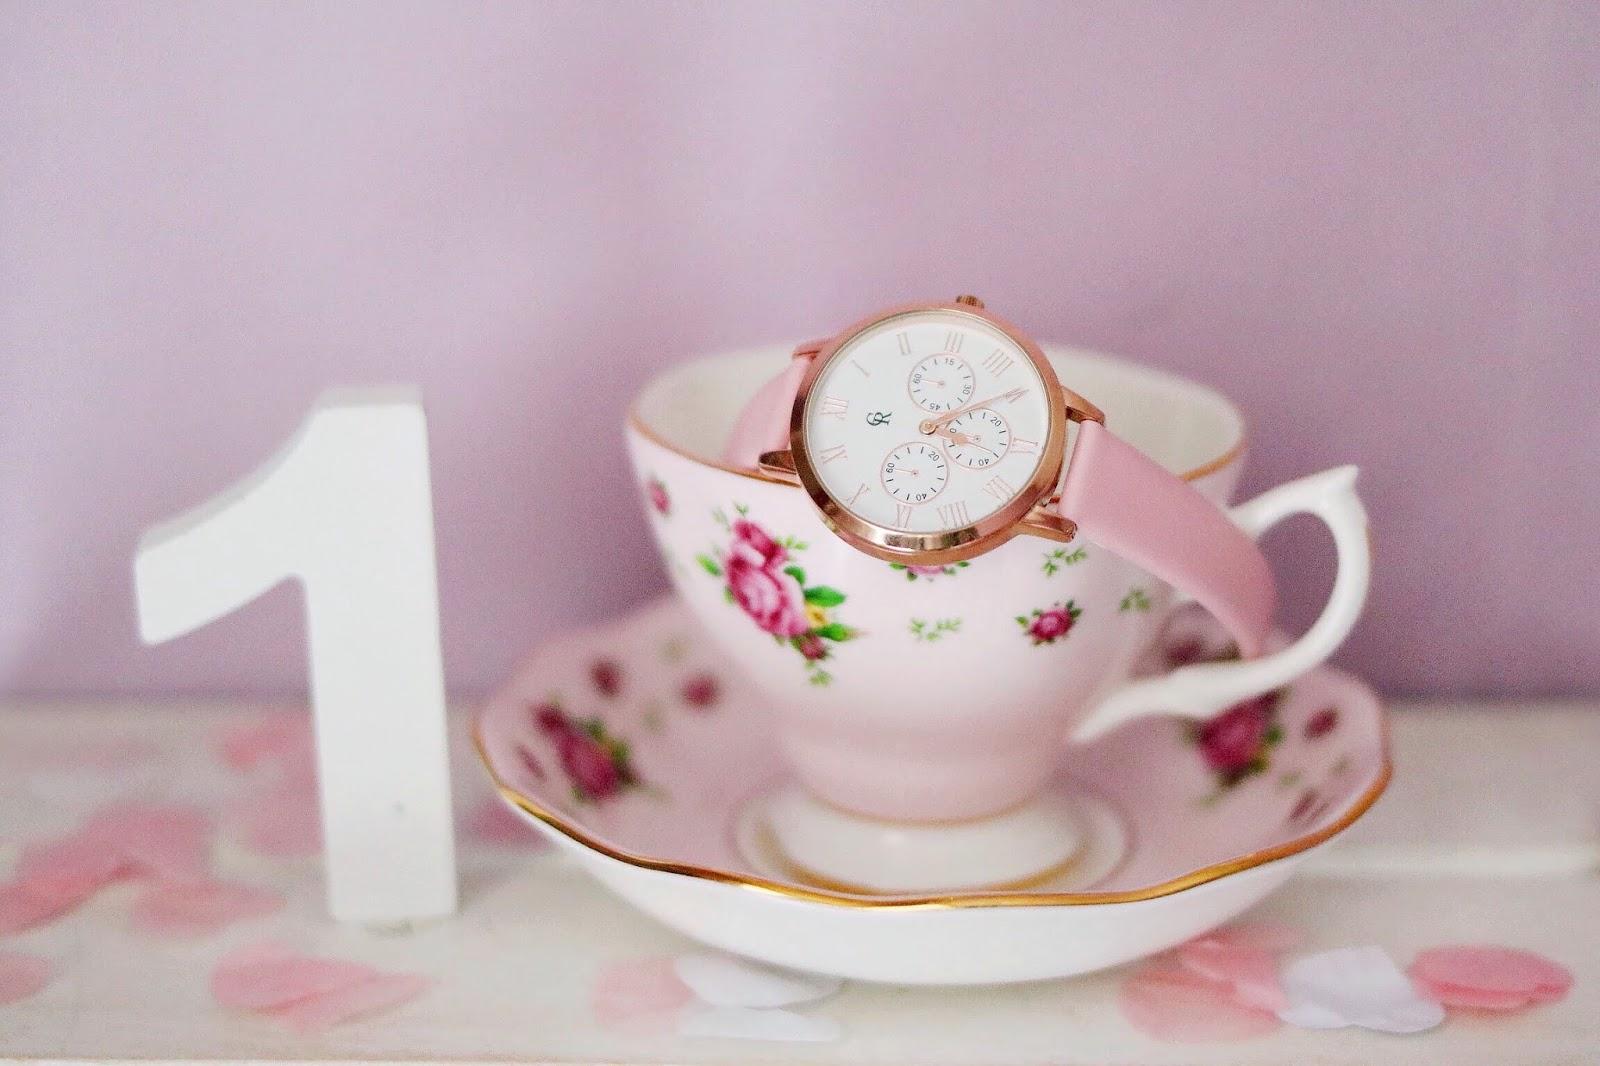 rosemademoiselle-rose-mademoiselle-concours-calendrier-de-l'avent-saint-valentin-montre-charlotte-raffaelli-la-rose-gold-basic